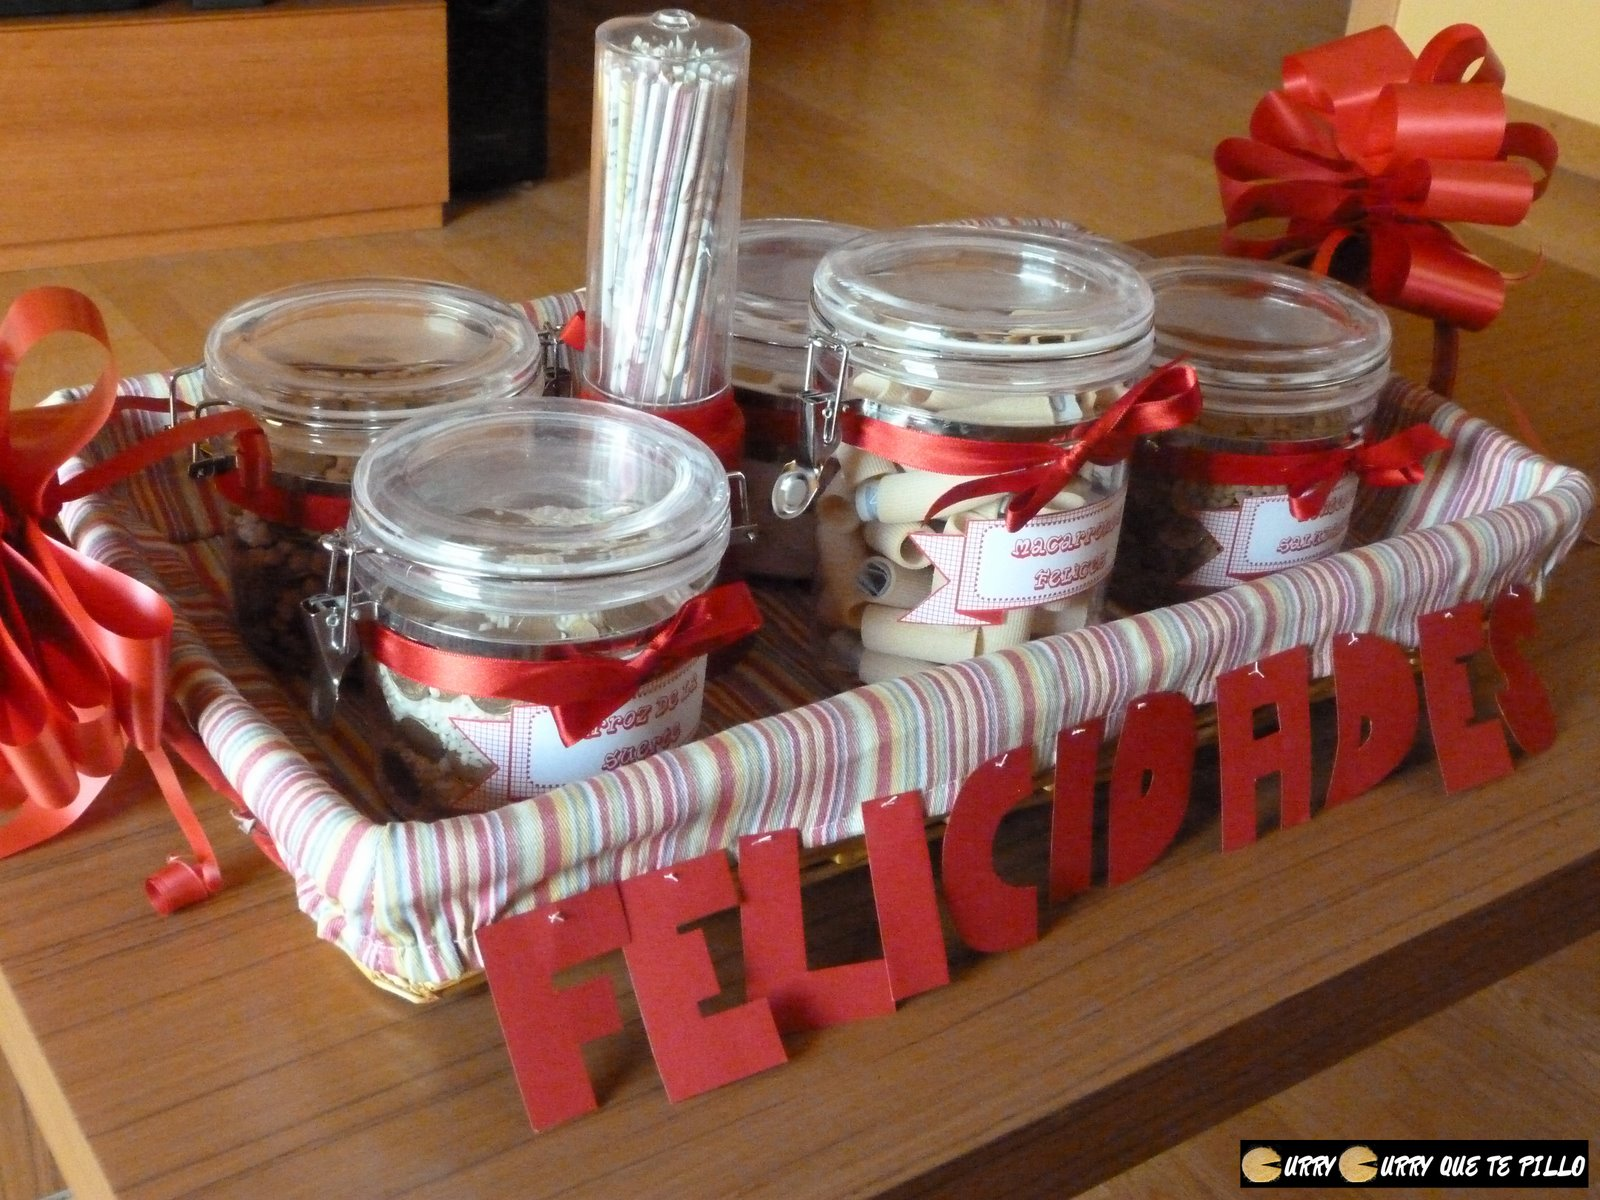 Un regalo de bodas especial y culinario currycurryquetepillo - Manualidades regalo boda ...